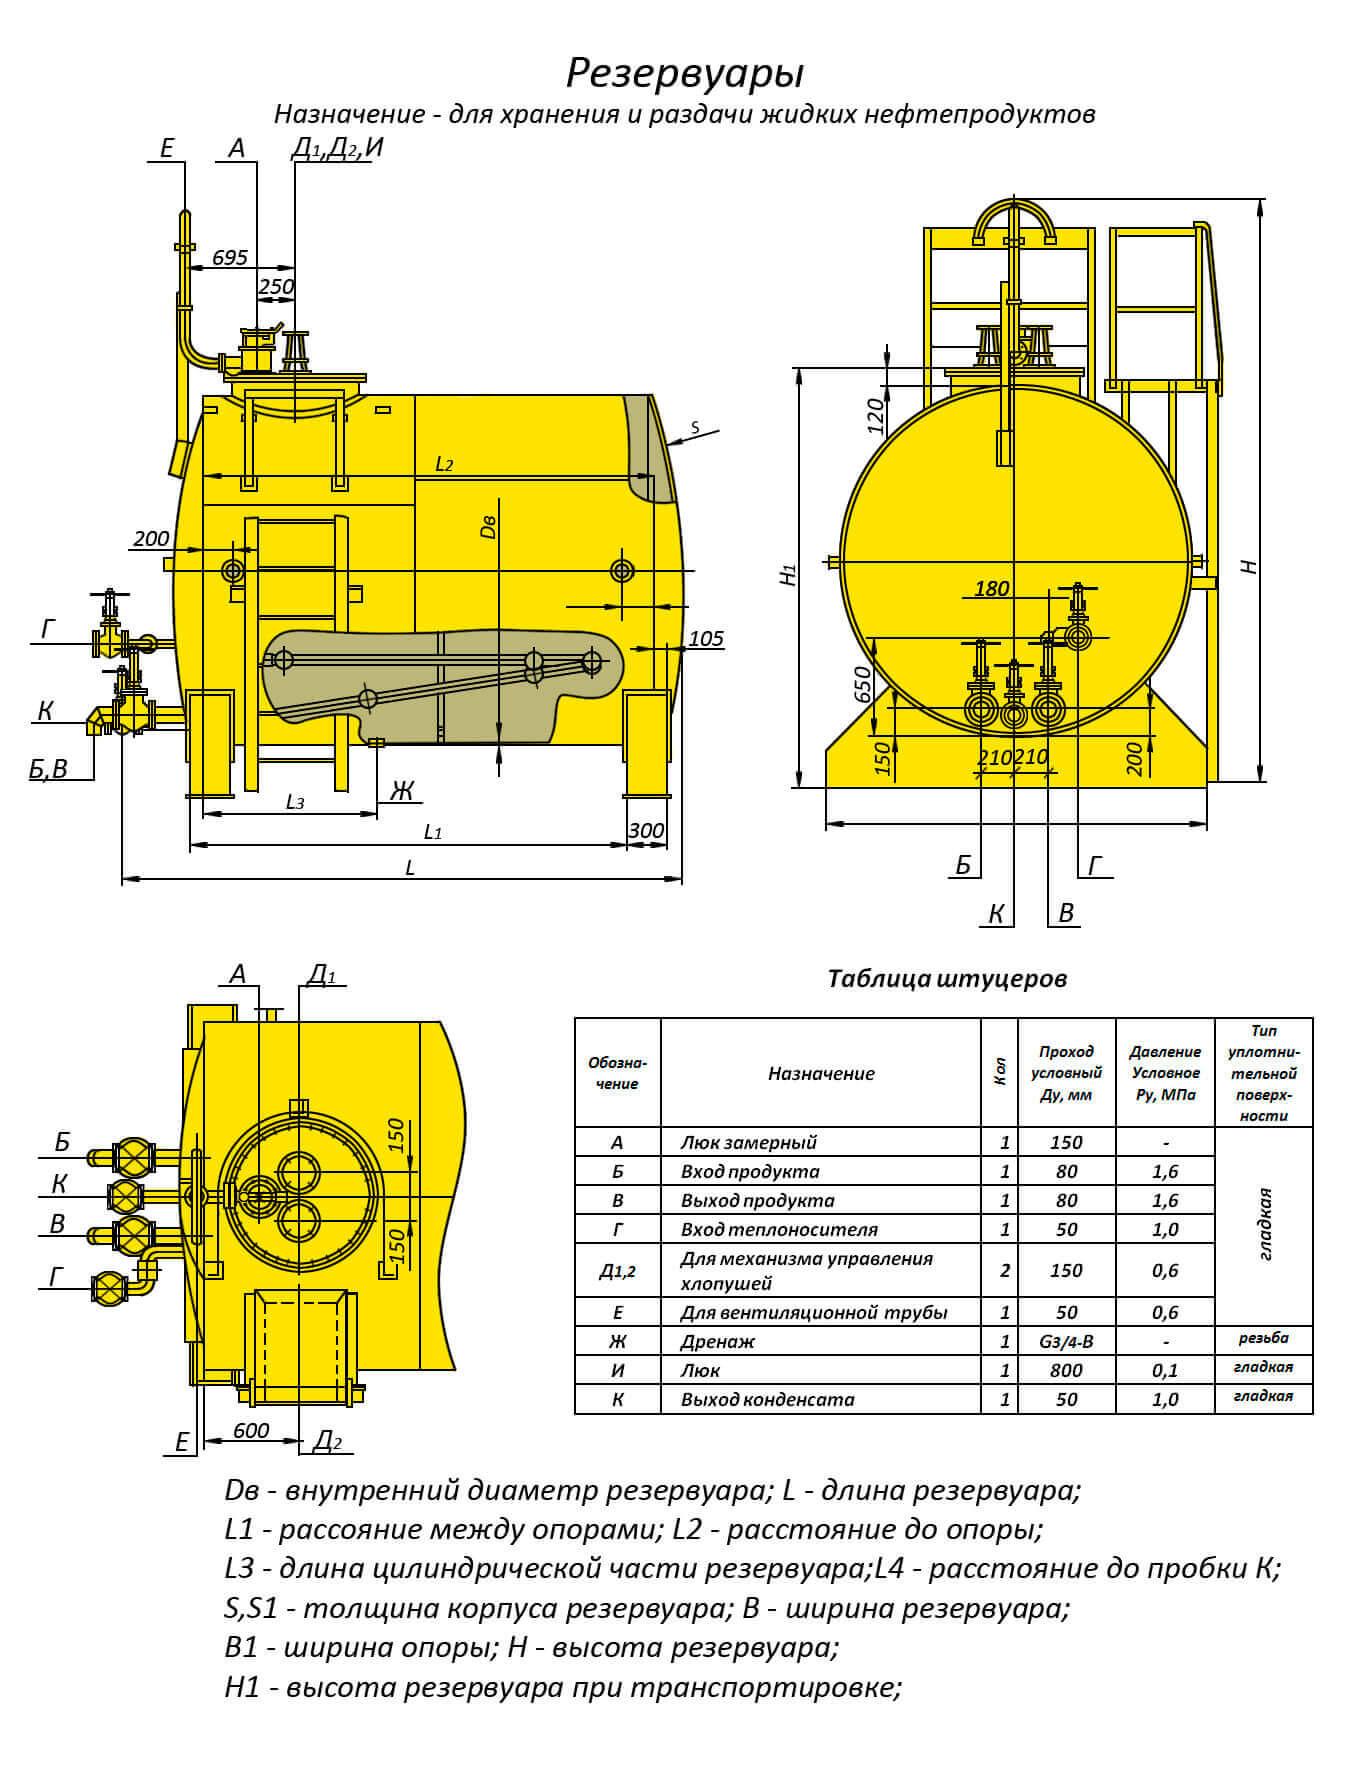 rezervuary i emkosti cilindricheskie rvs rgs 5 Емкости и резервуары для кислот и агрессивных сред